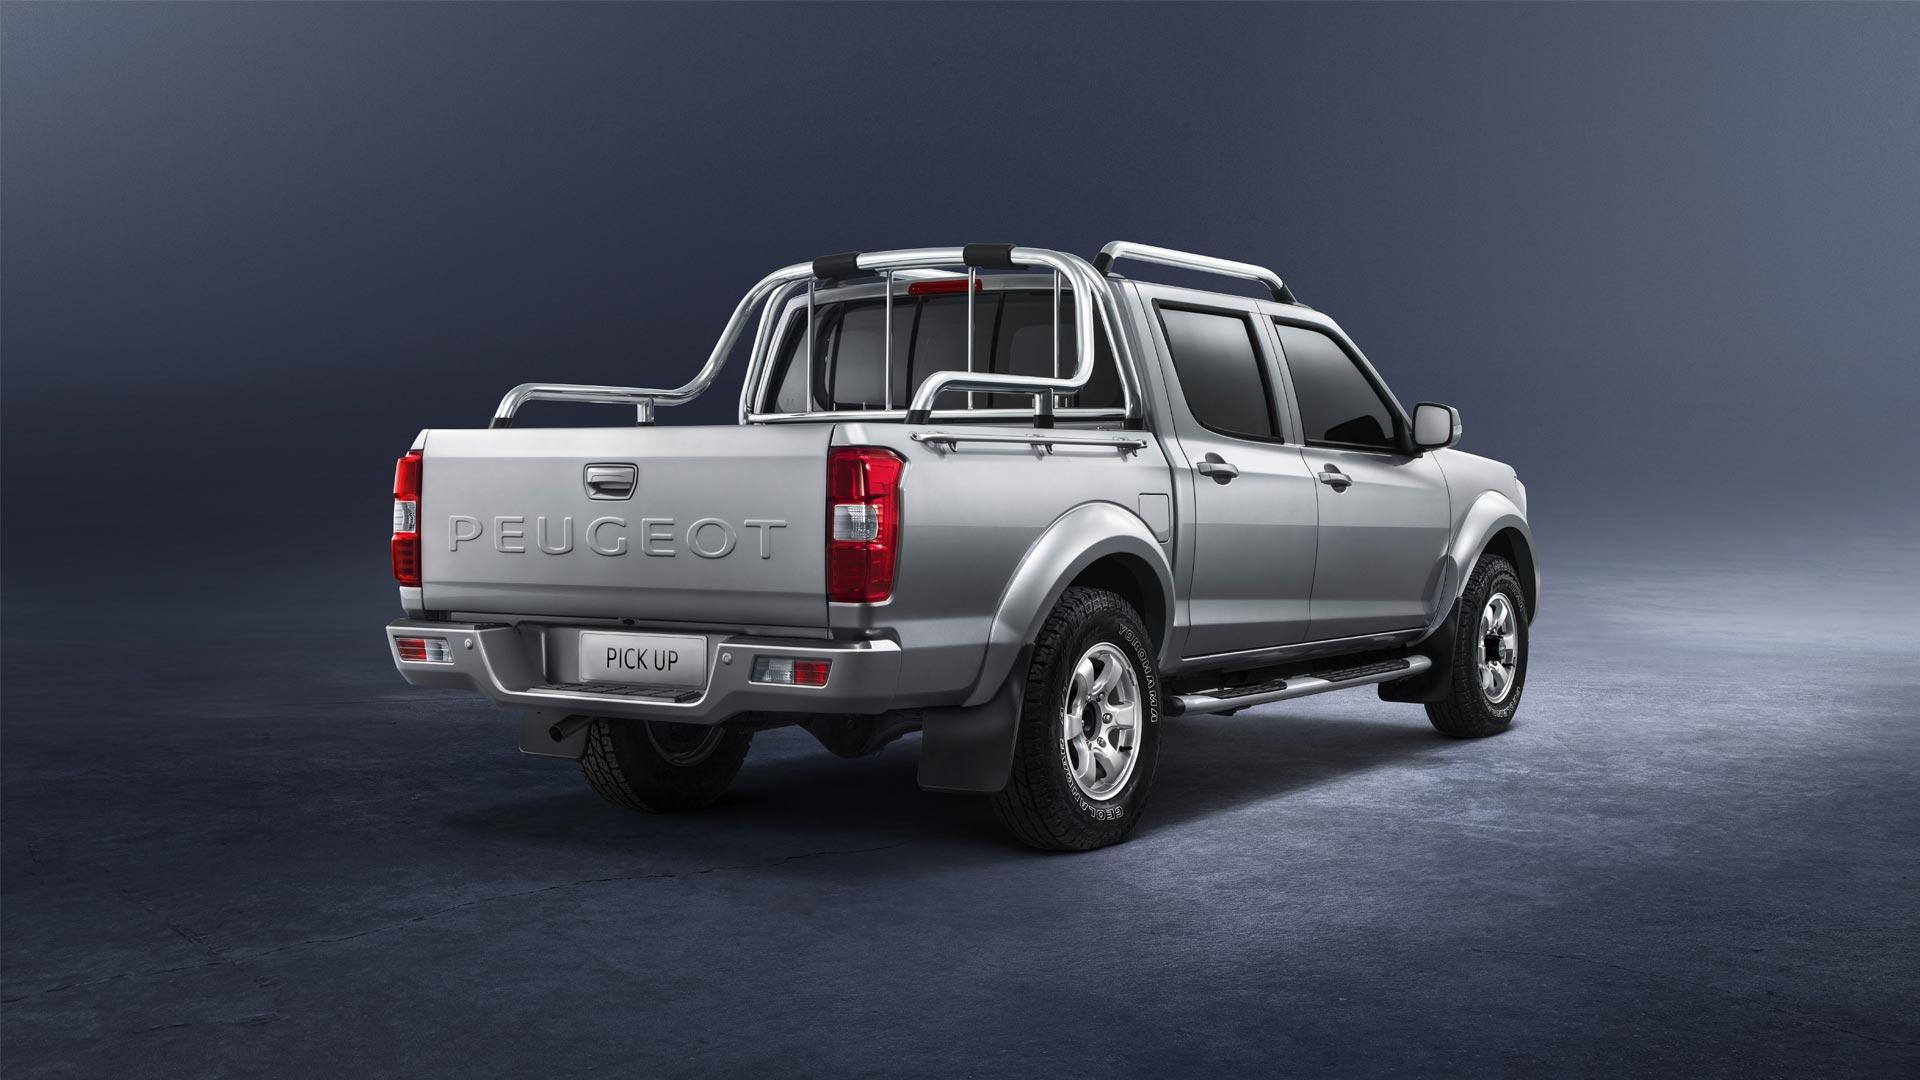 Peugeot-Pick-Up-4